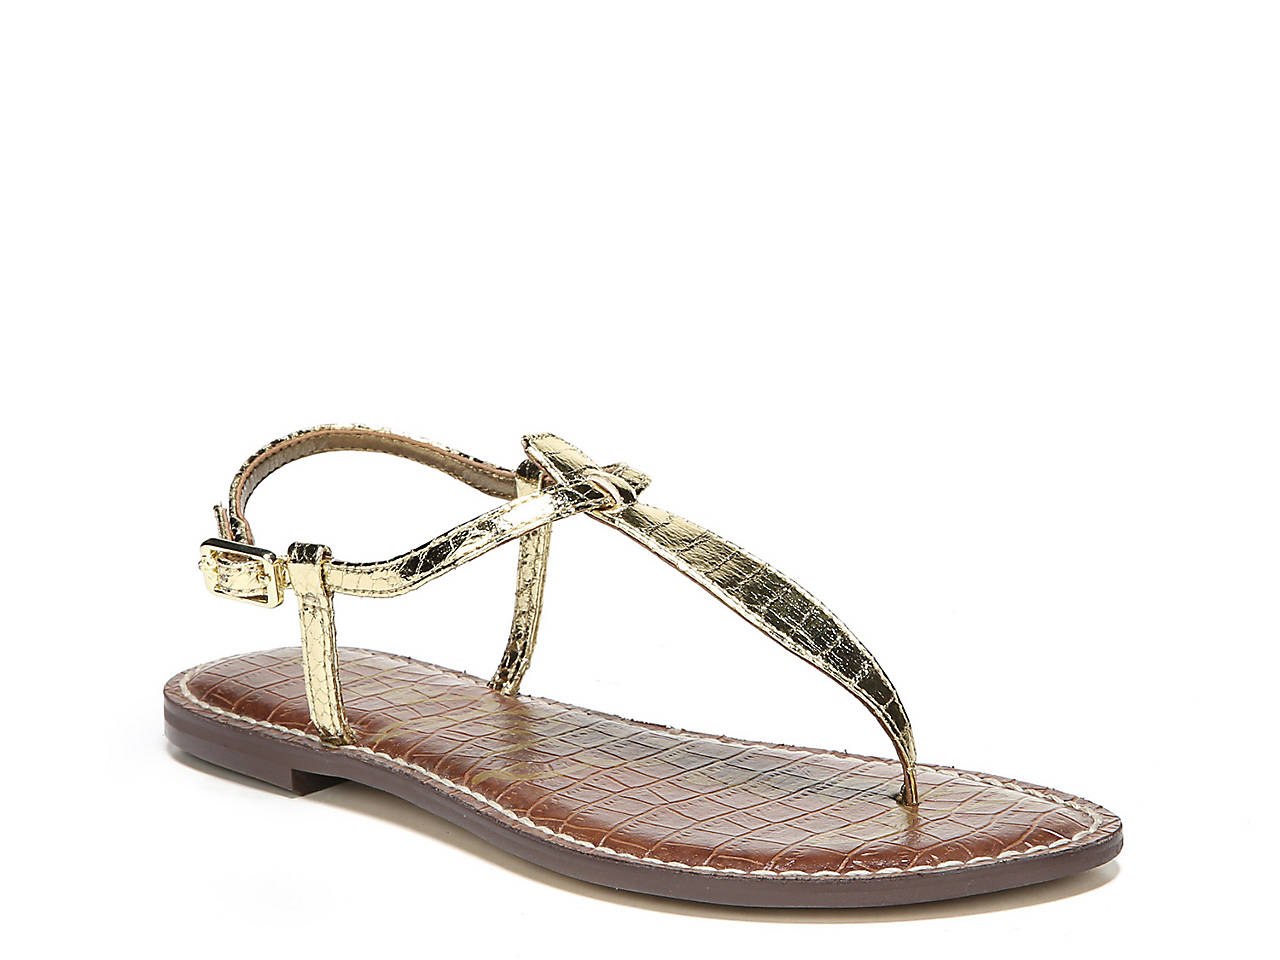 873826ad6 Sam Edelman Gigi Sandal Women s Shoes